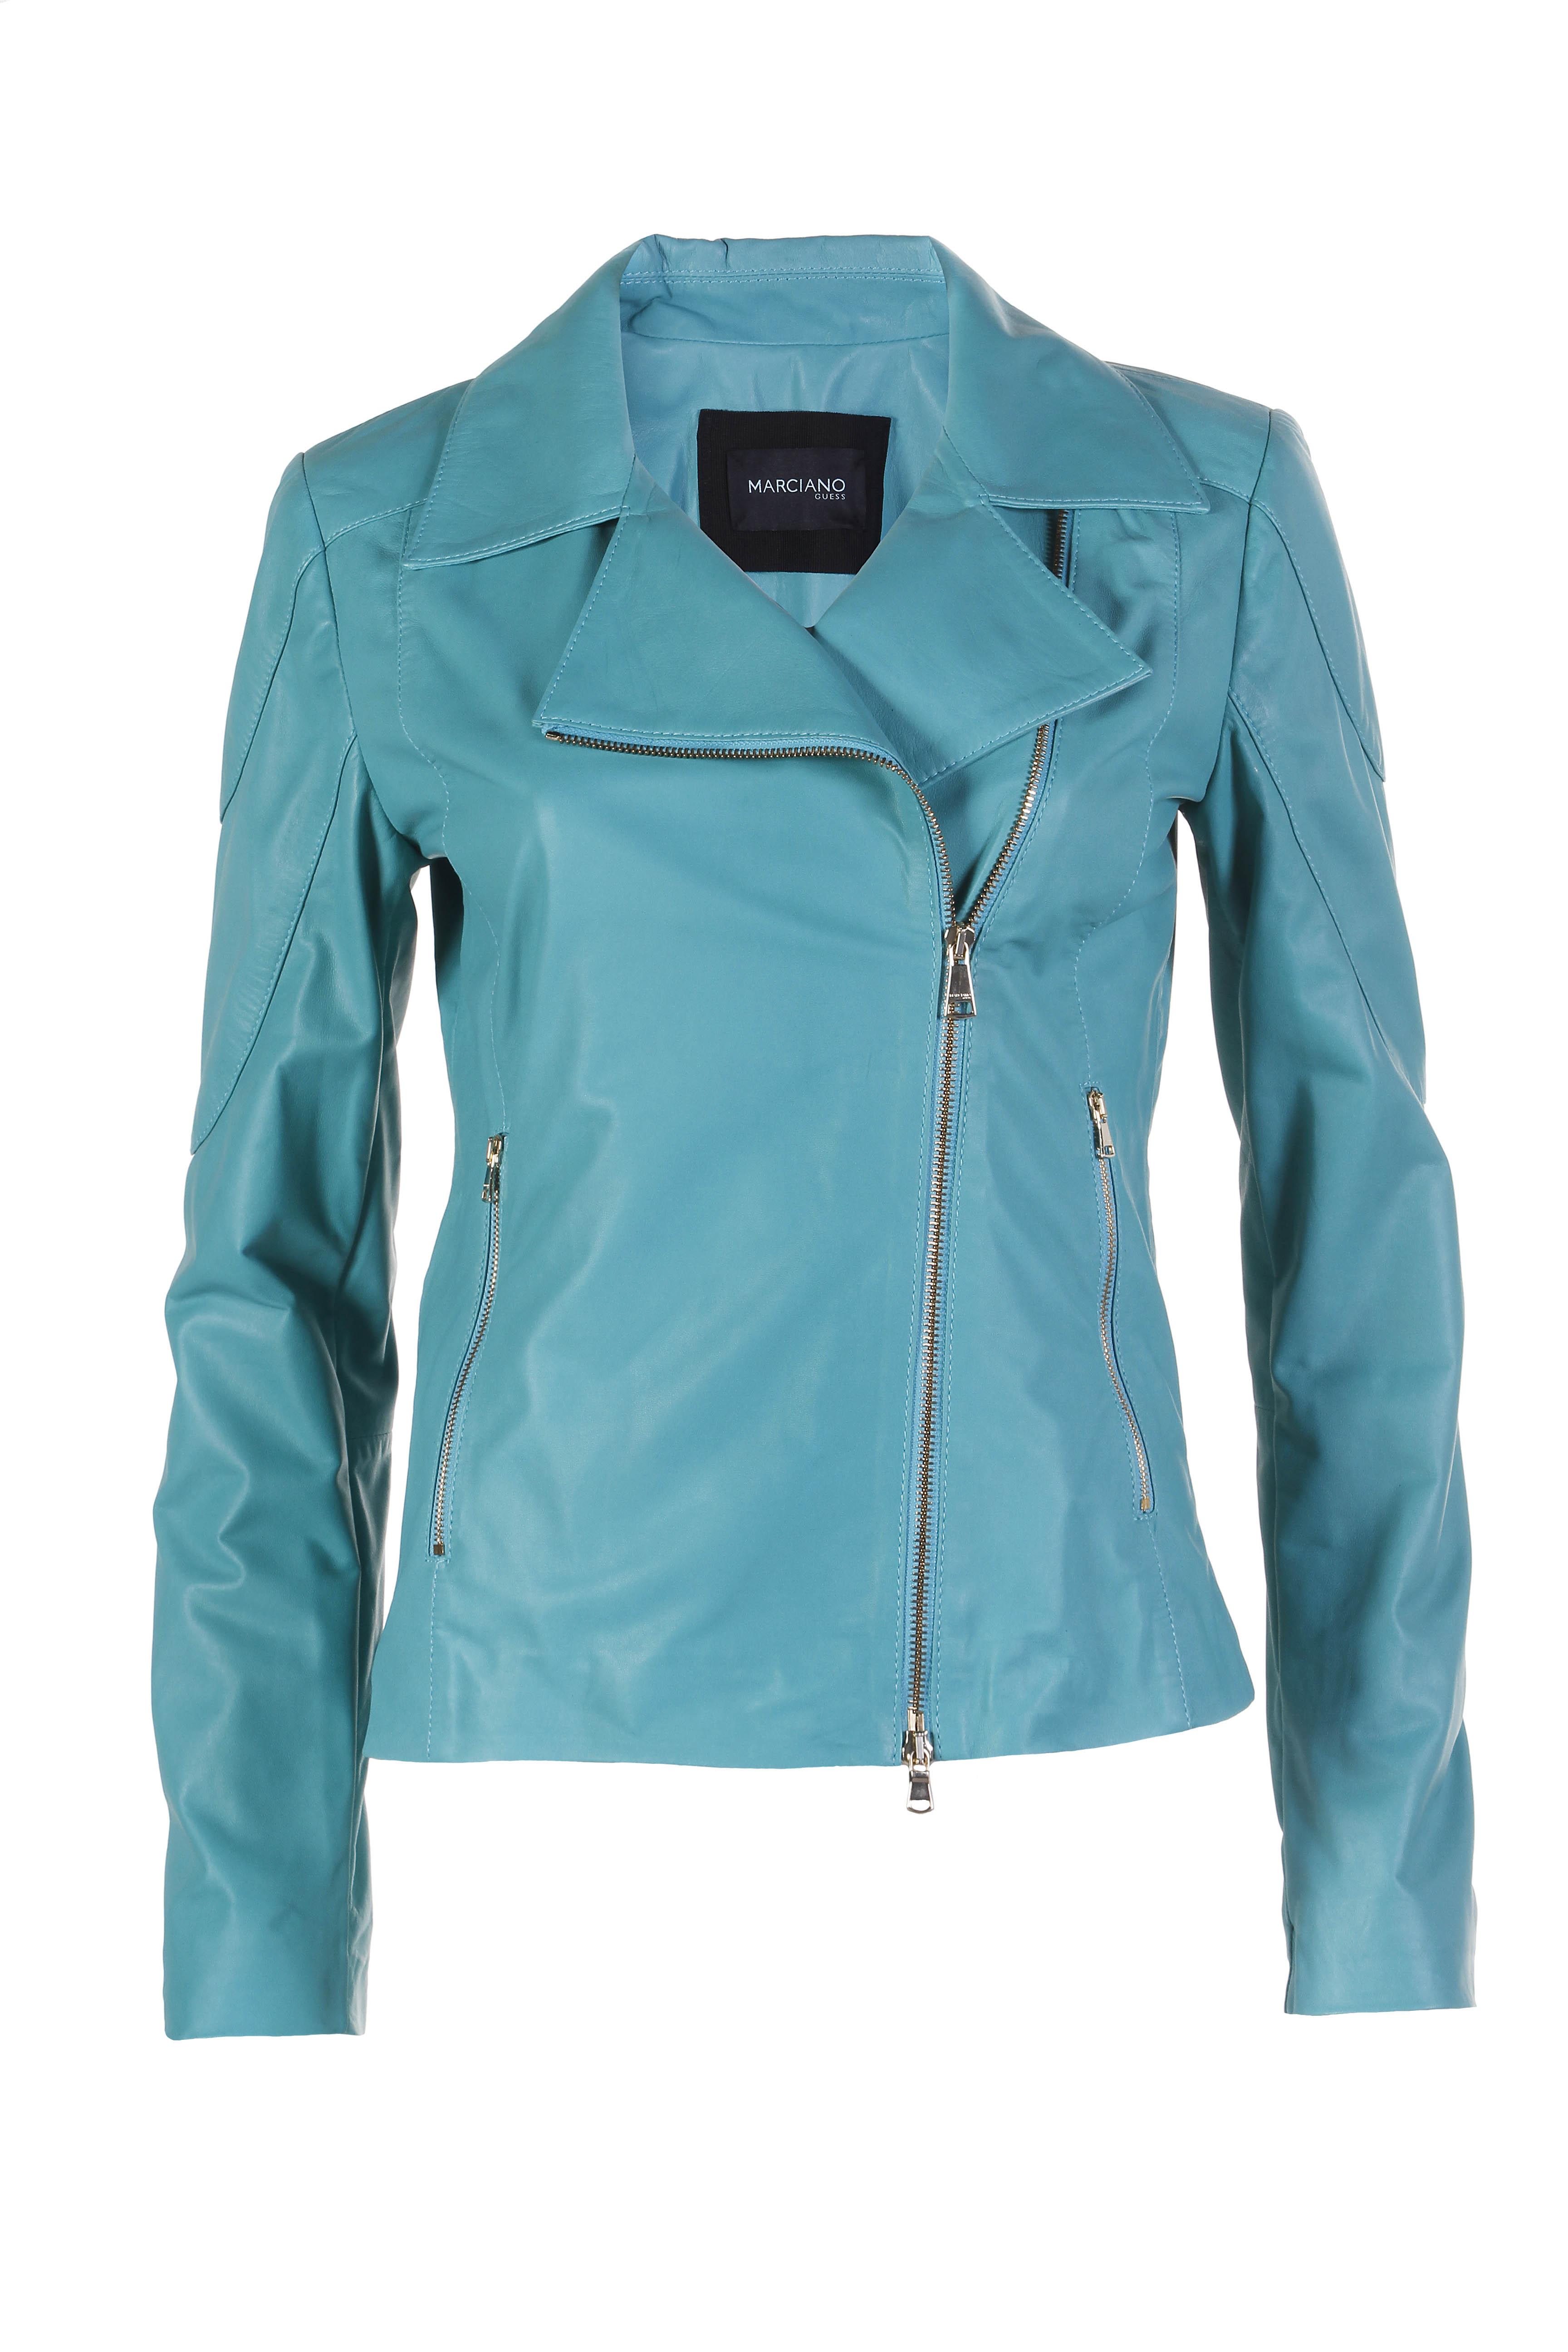 detailed look 00860 b98c2 guess-giacca-in-pelle-chiodo-blu-azzurra-zip-summer-spring ...